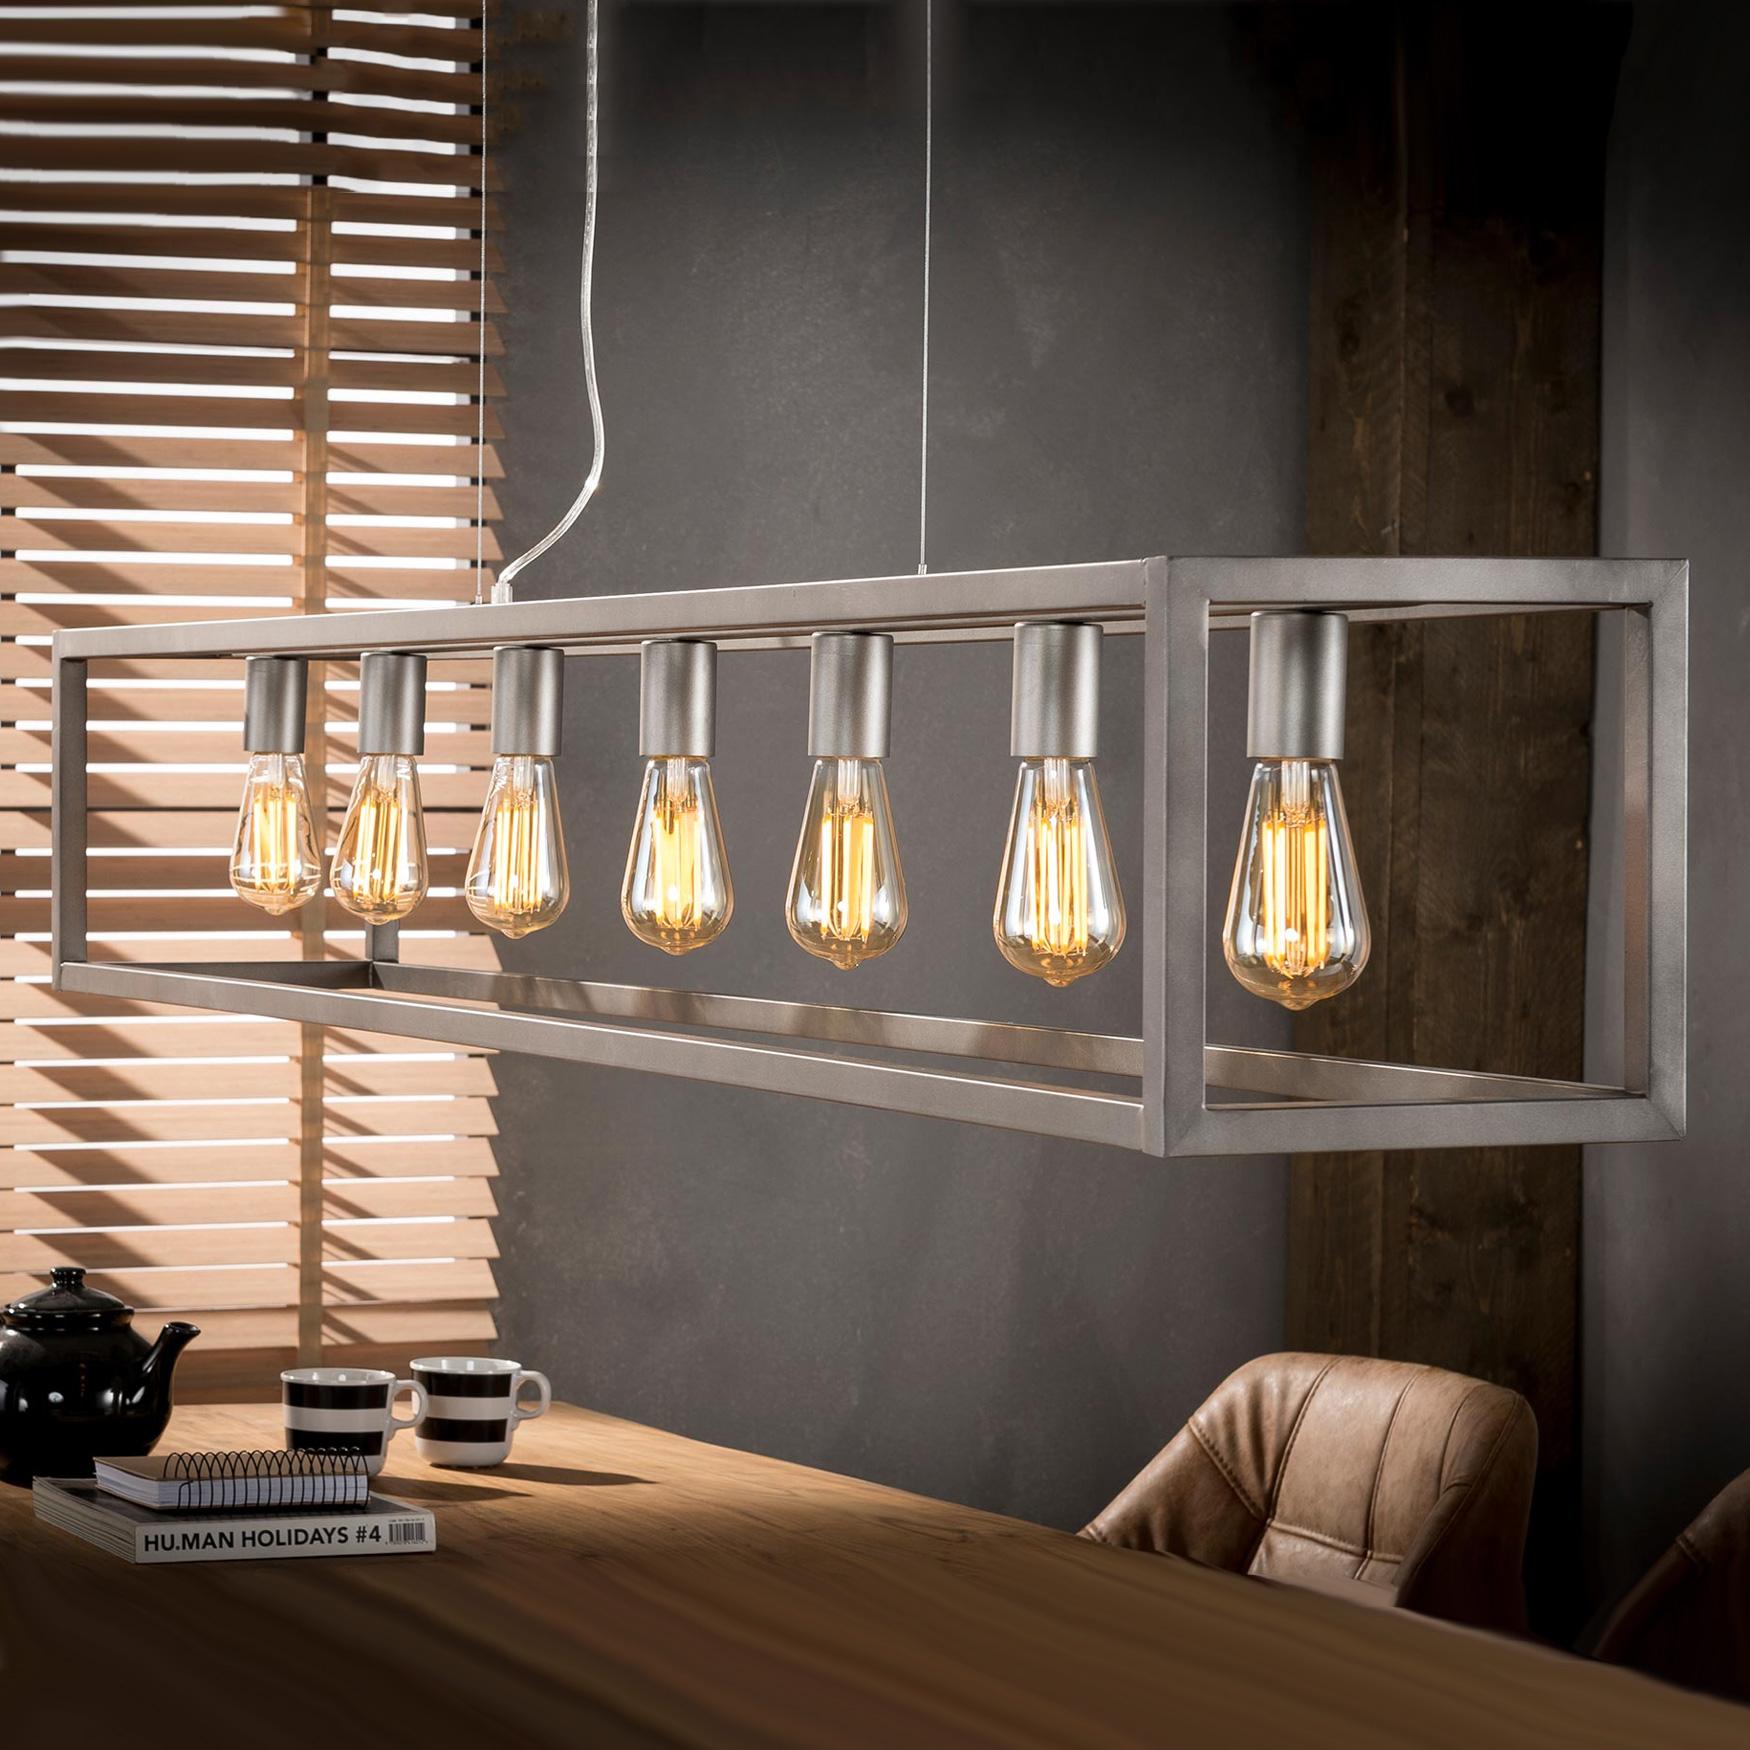 Industriële Hanglamp 'Terrance' 7-lamps korting